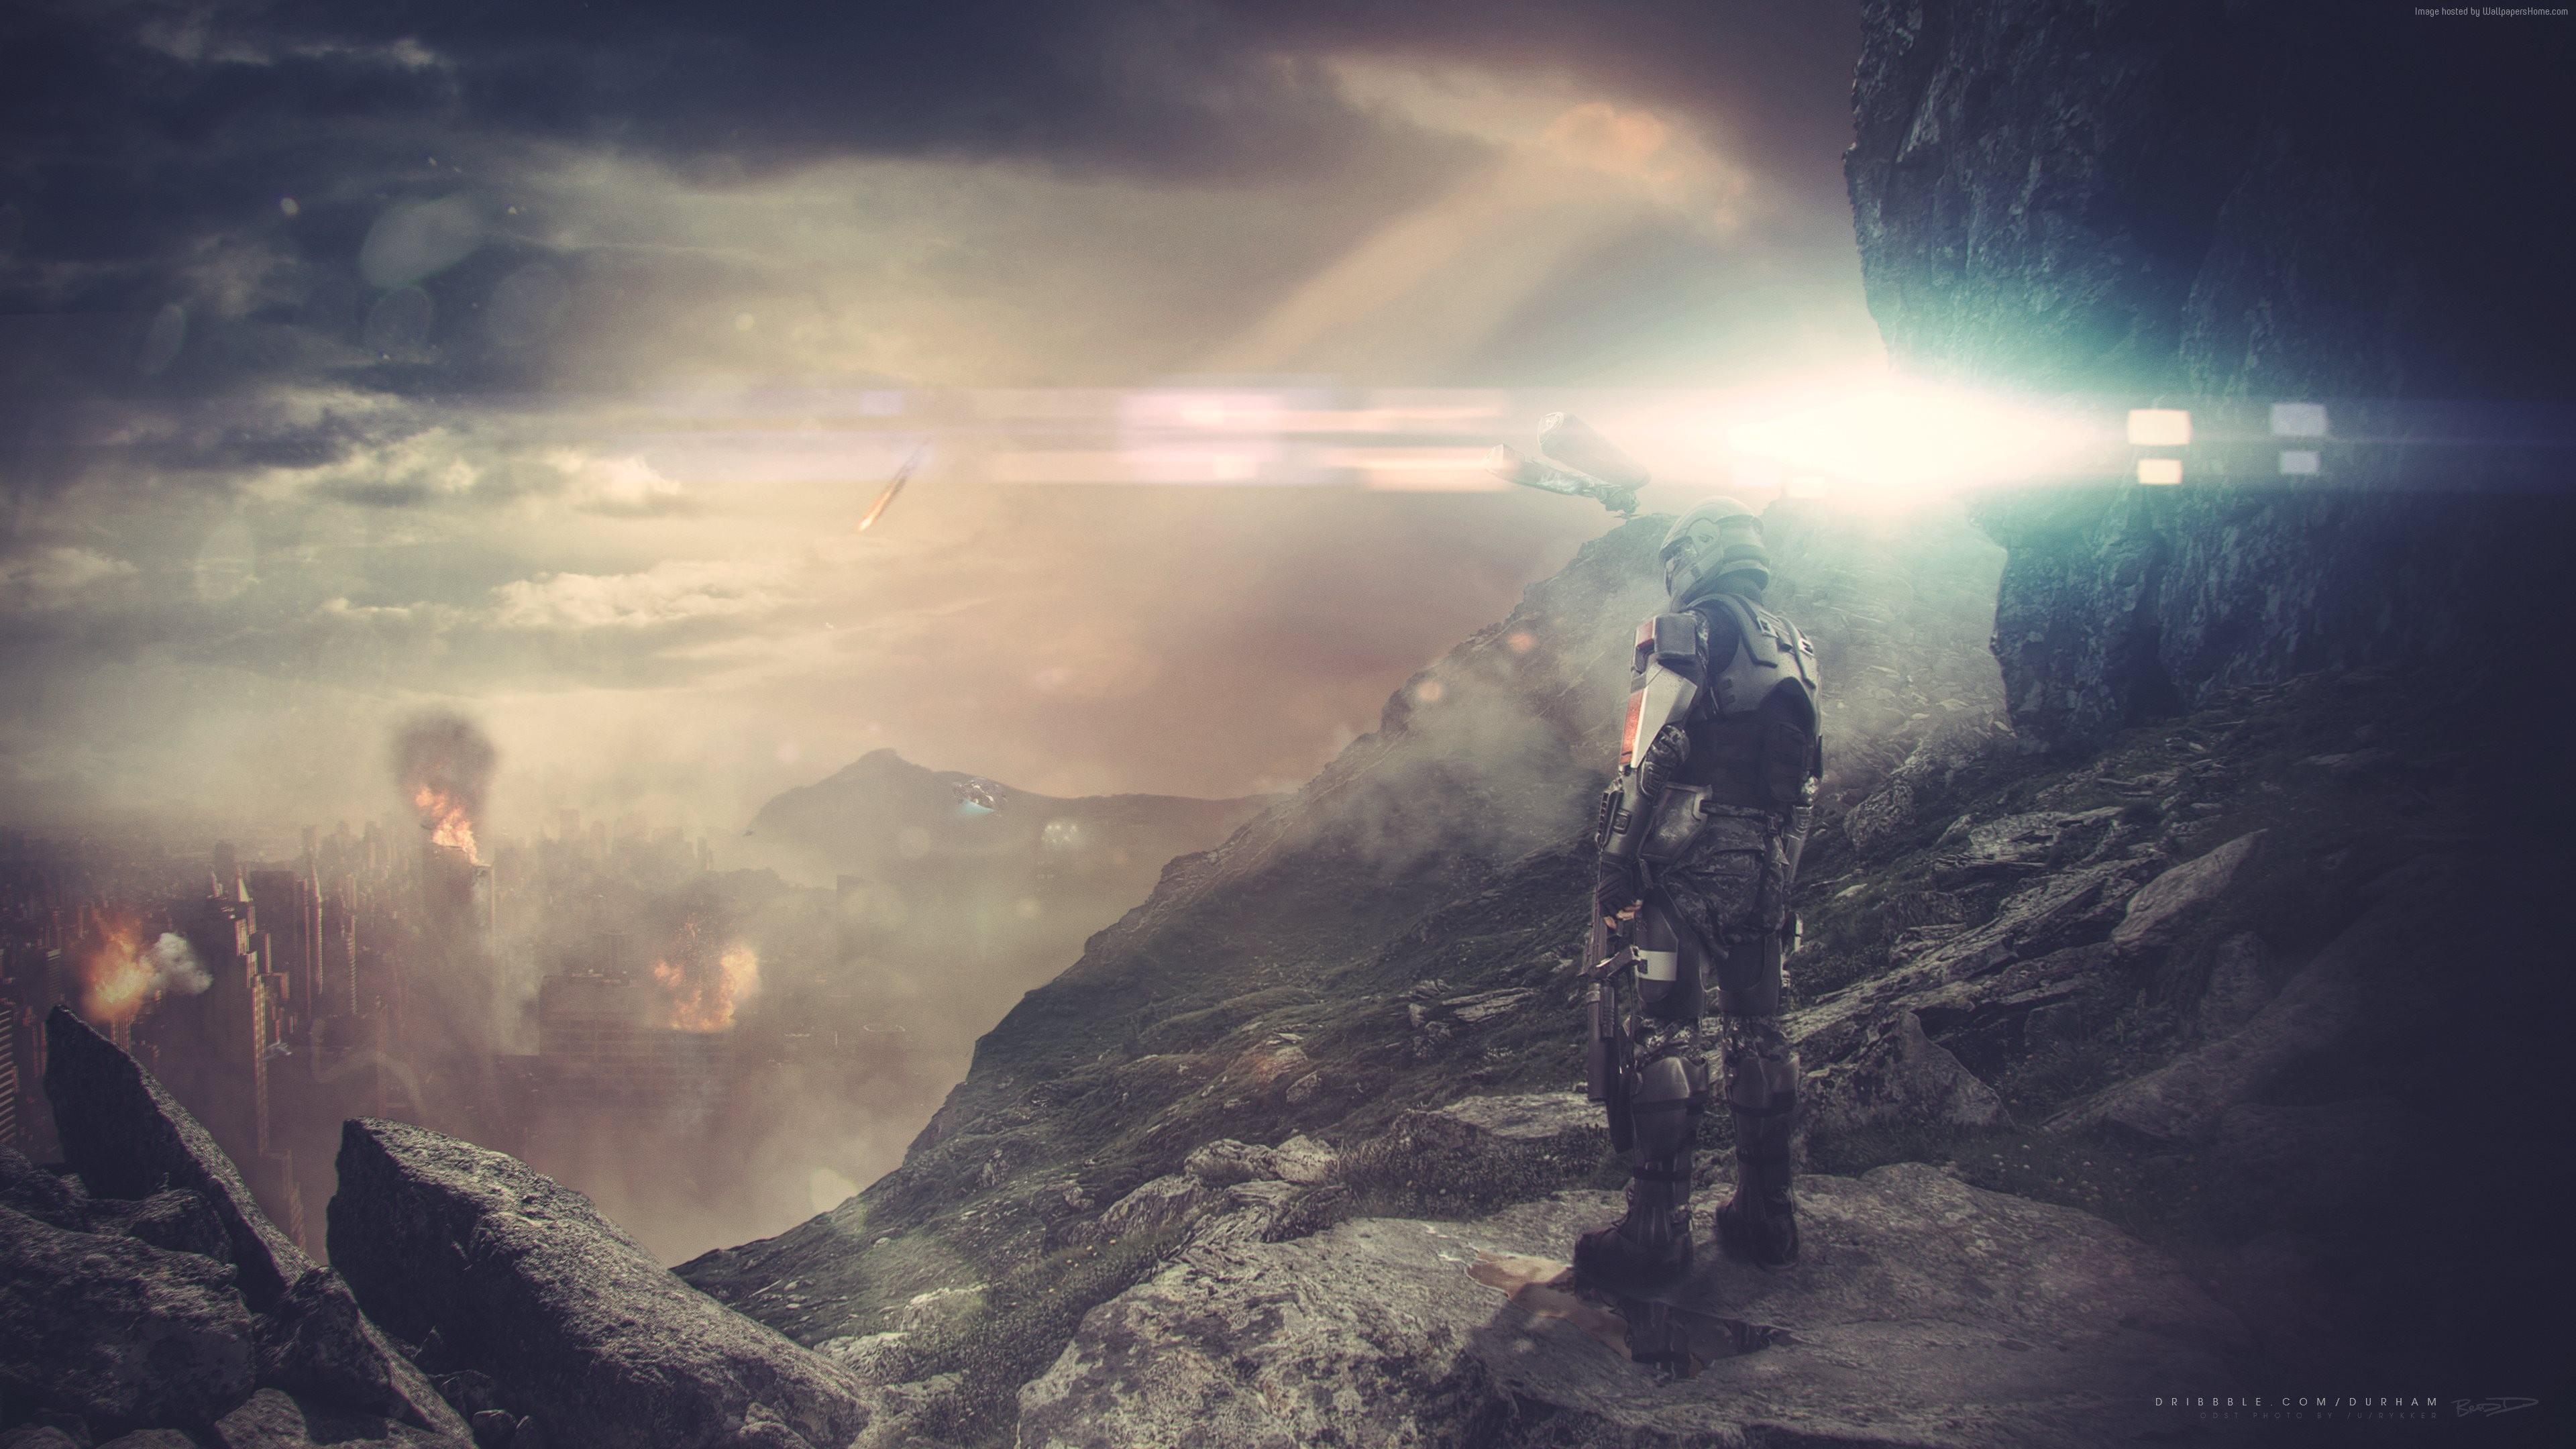 Halo 5: Guardians Wallpaper, Art / Recent: Halo 5: Guardians, game ...